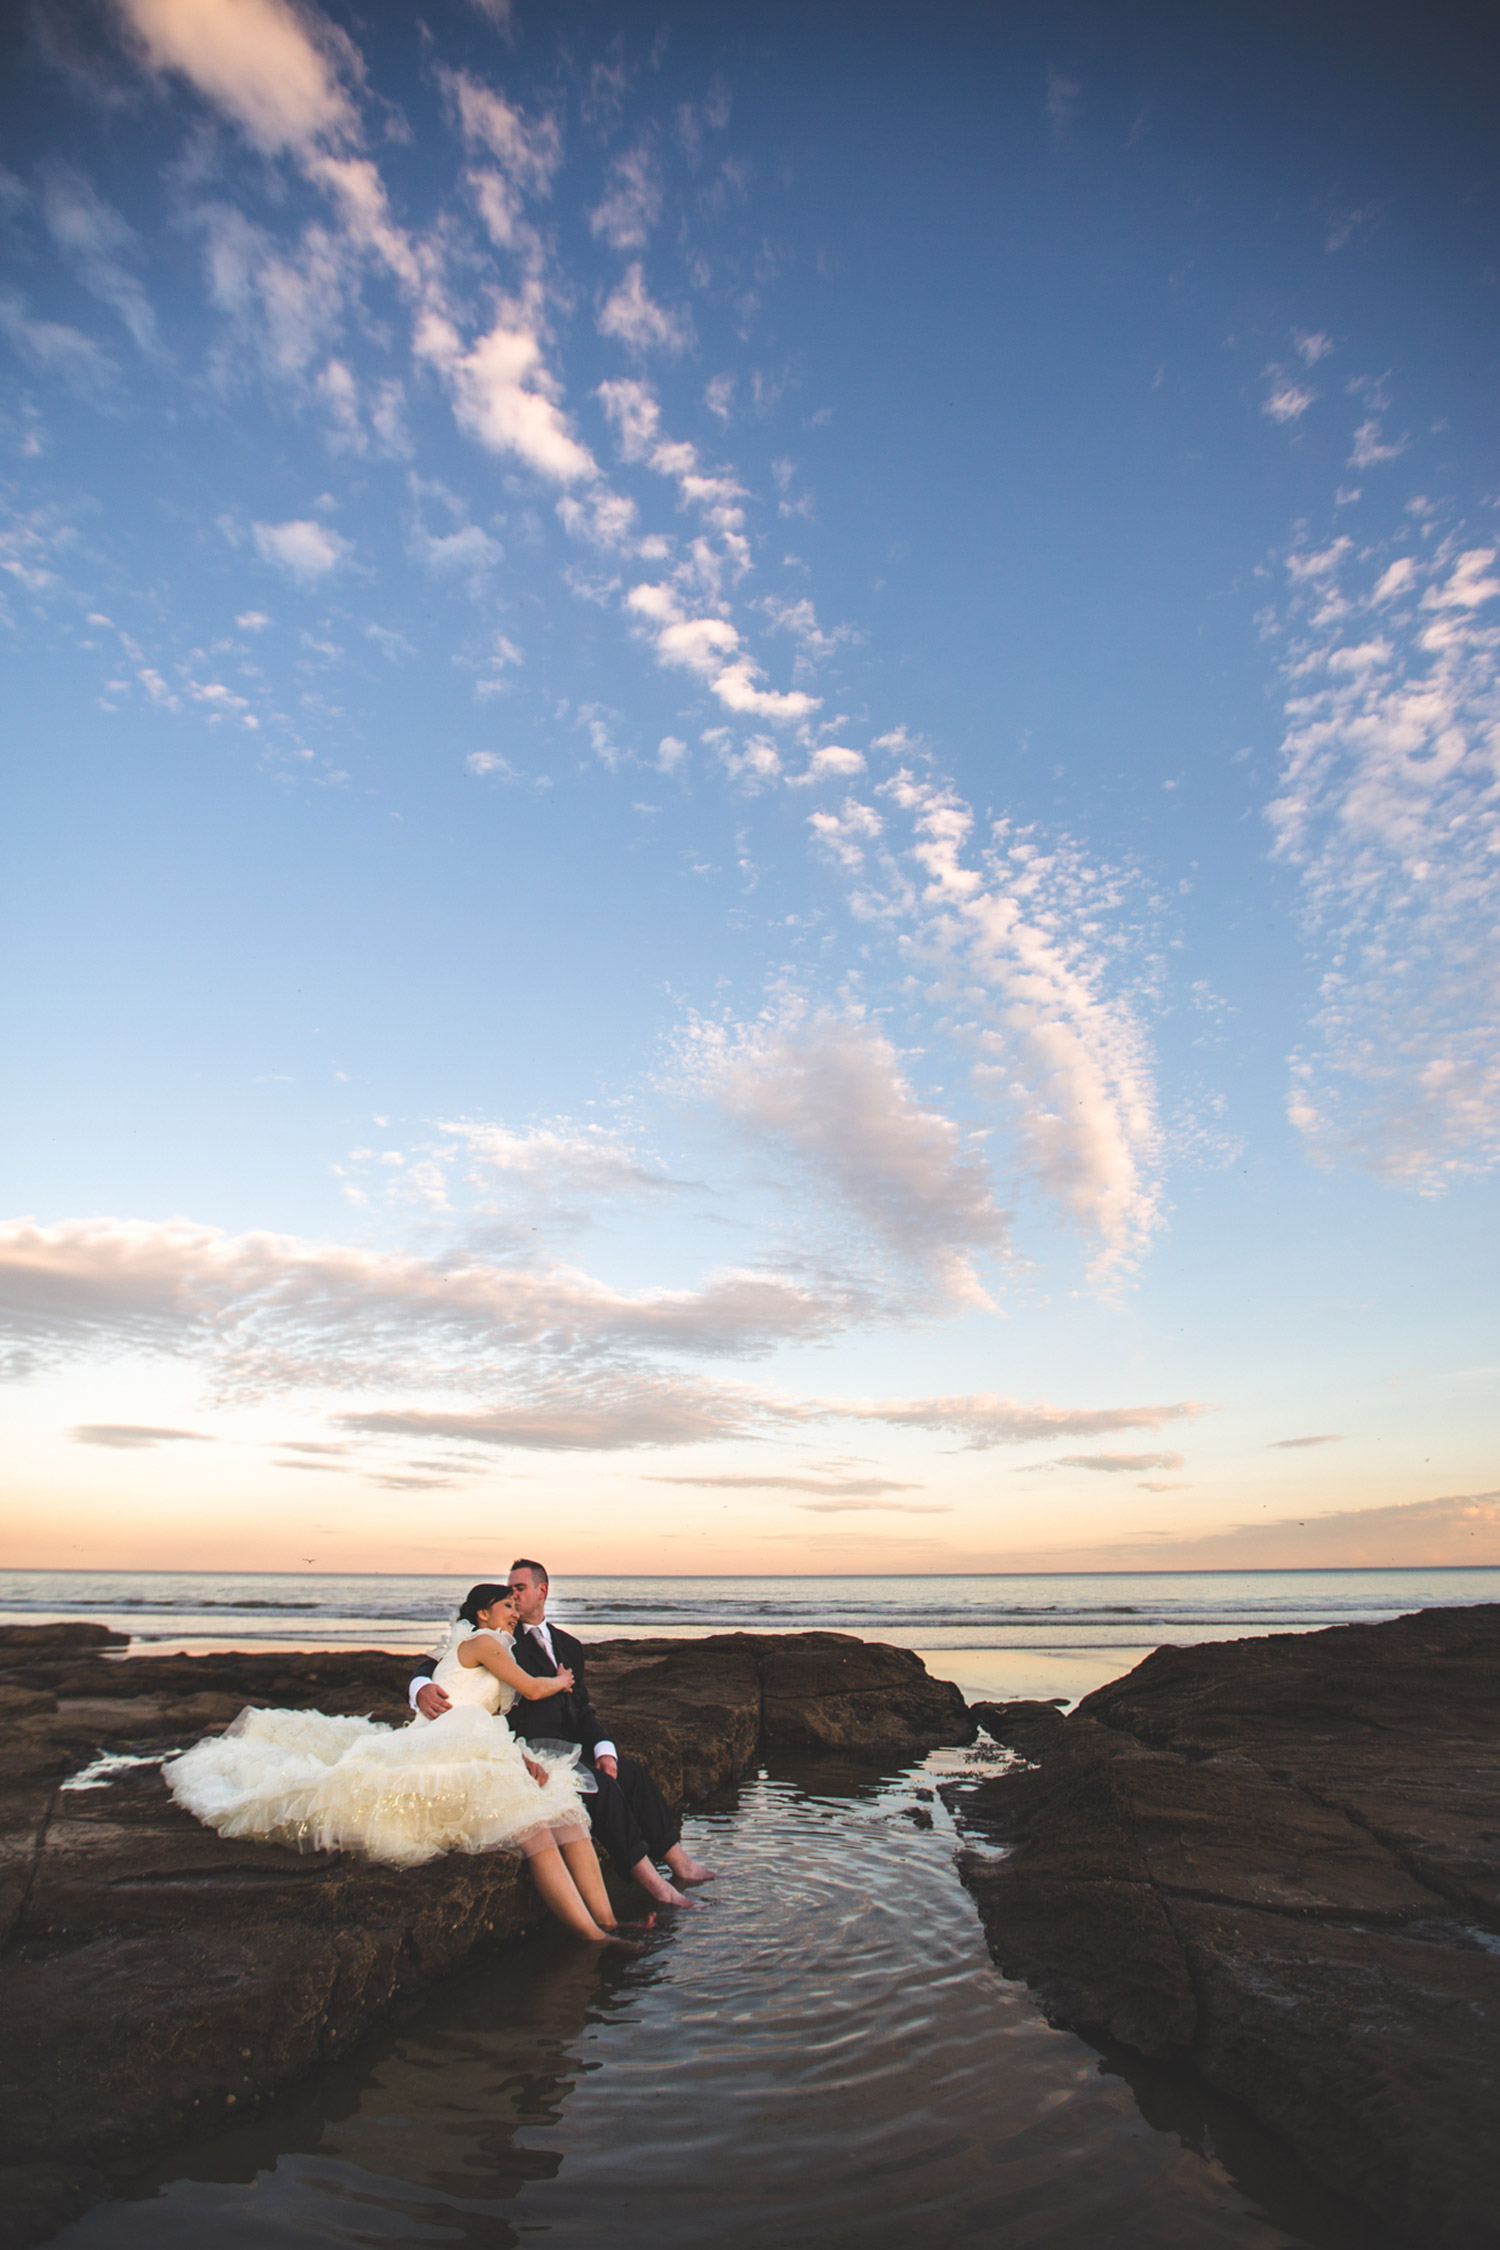 Beach Pre Wedding Elopement Packages, Brisbane - Top Sunshine Coast, Queensland, Australian Destination Photographers